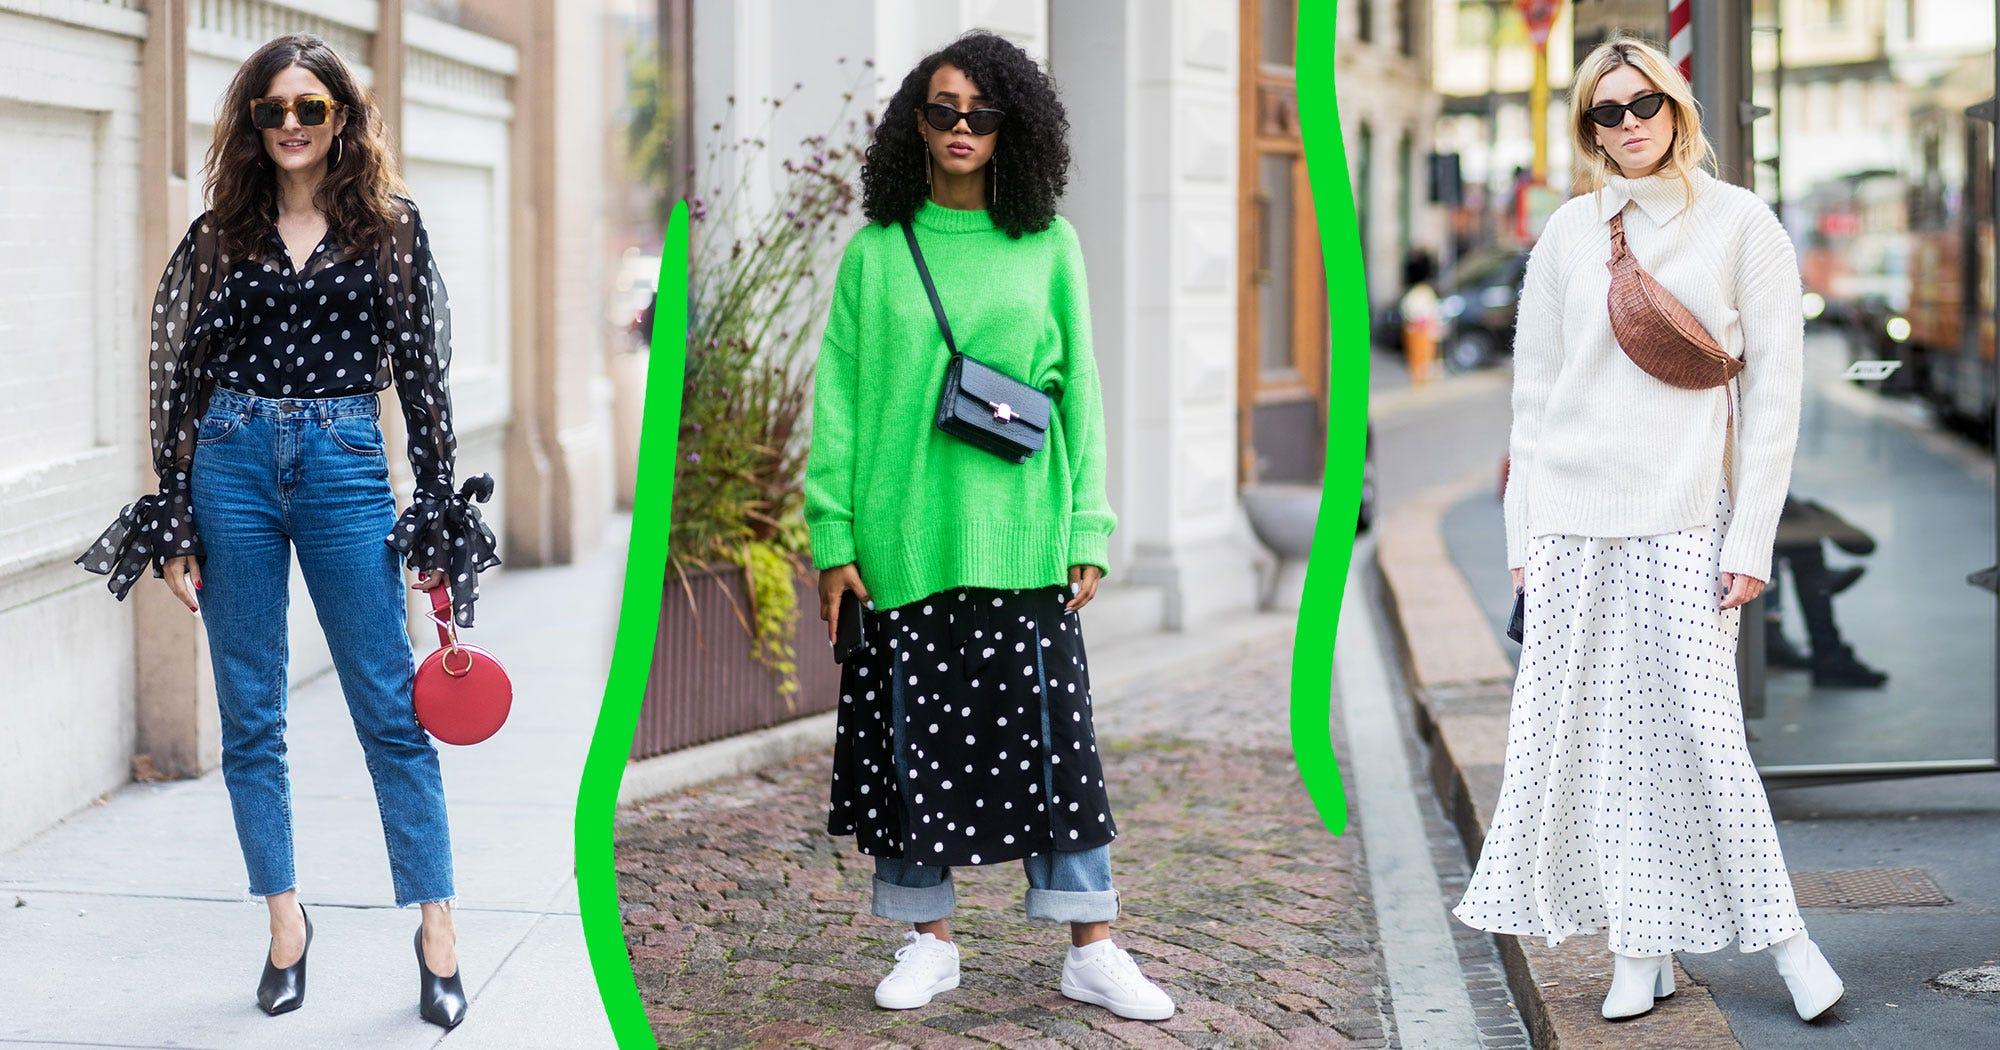 392e89cef3 5 Ways To Wear Spring's Polka Dot Trend